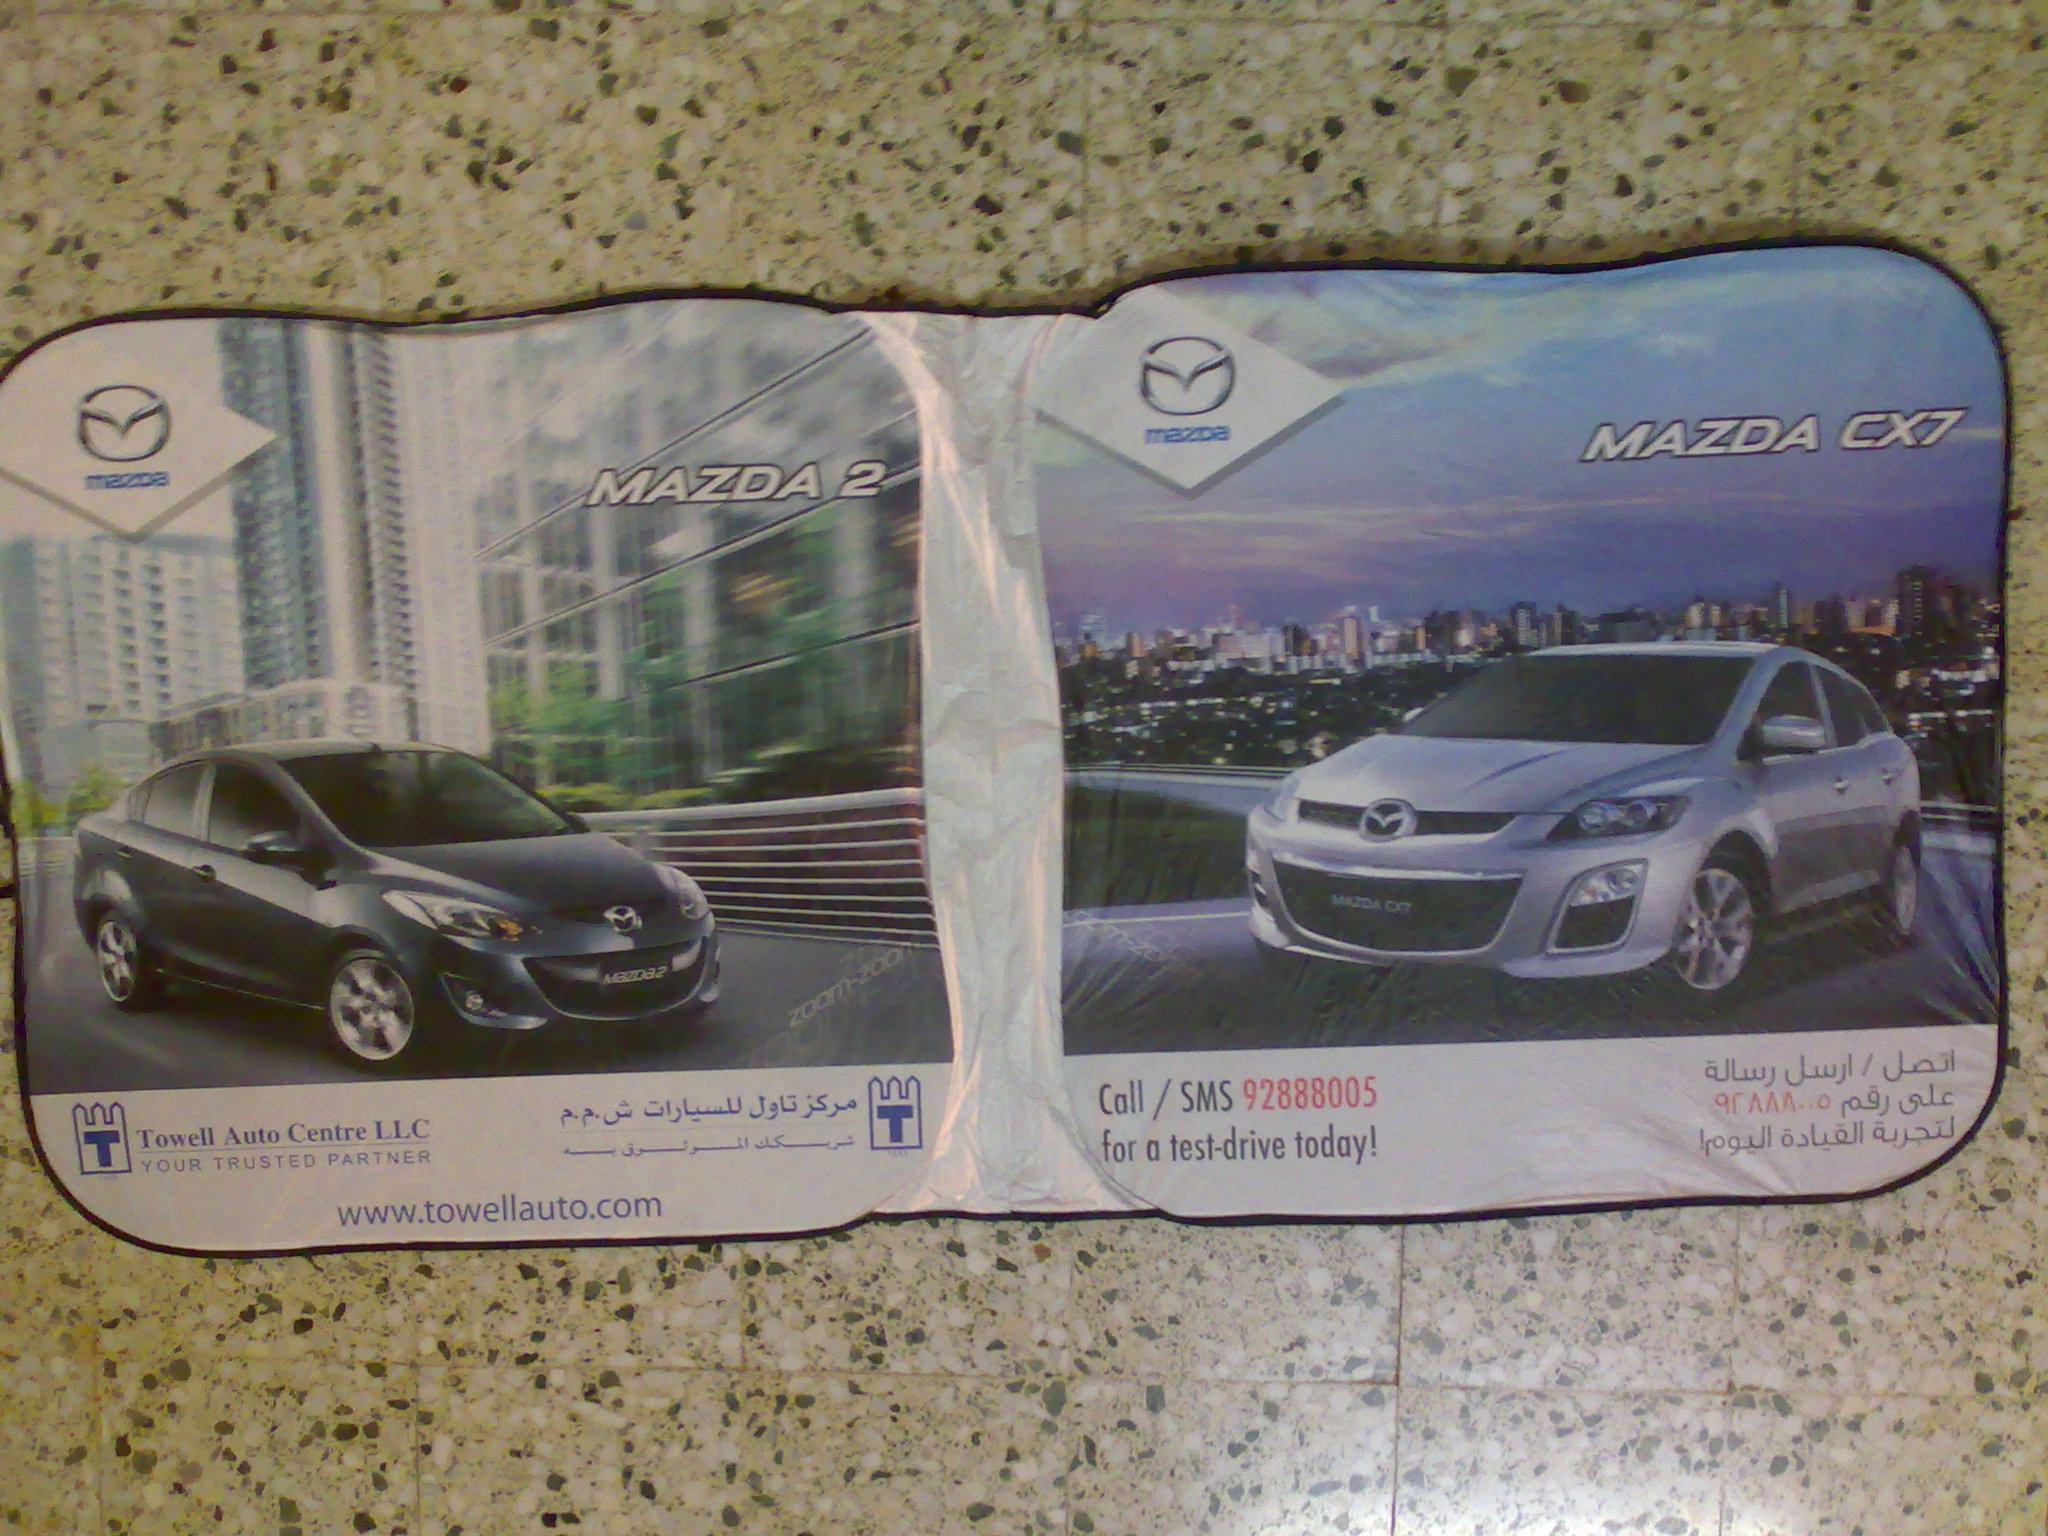 Square Mazda Sunshade